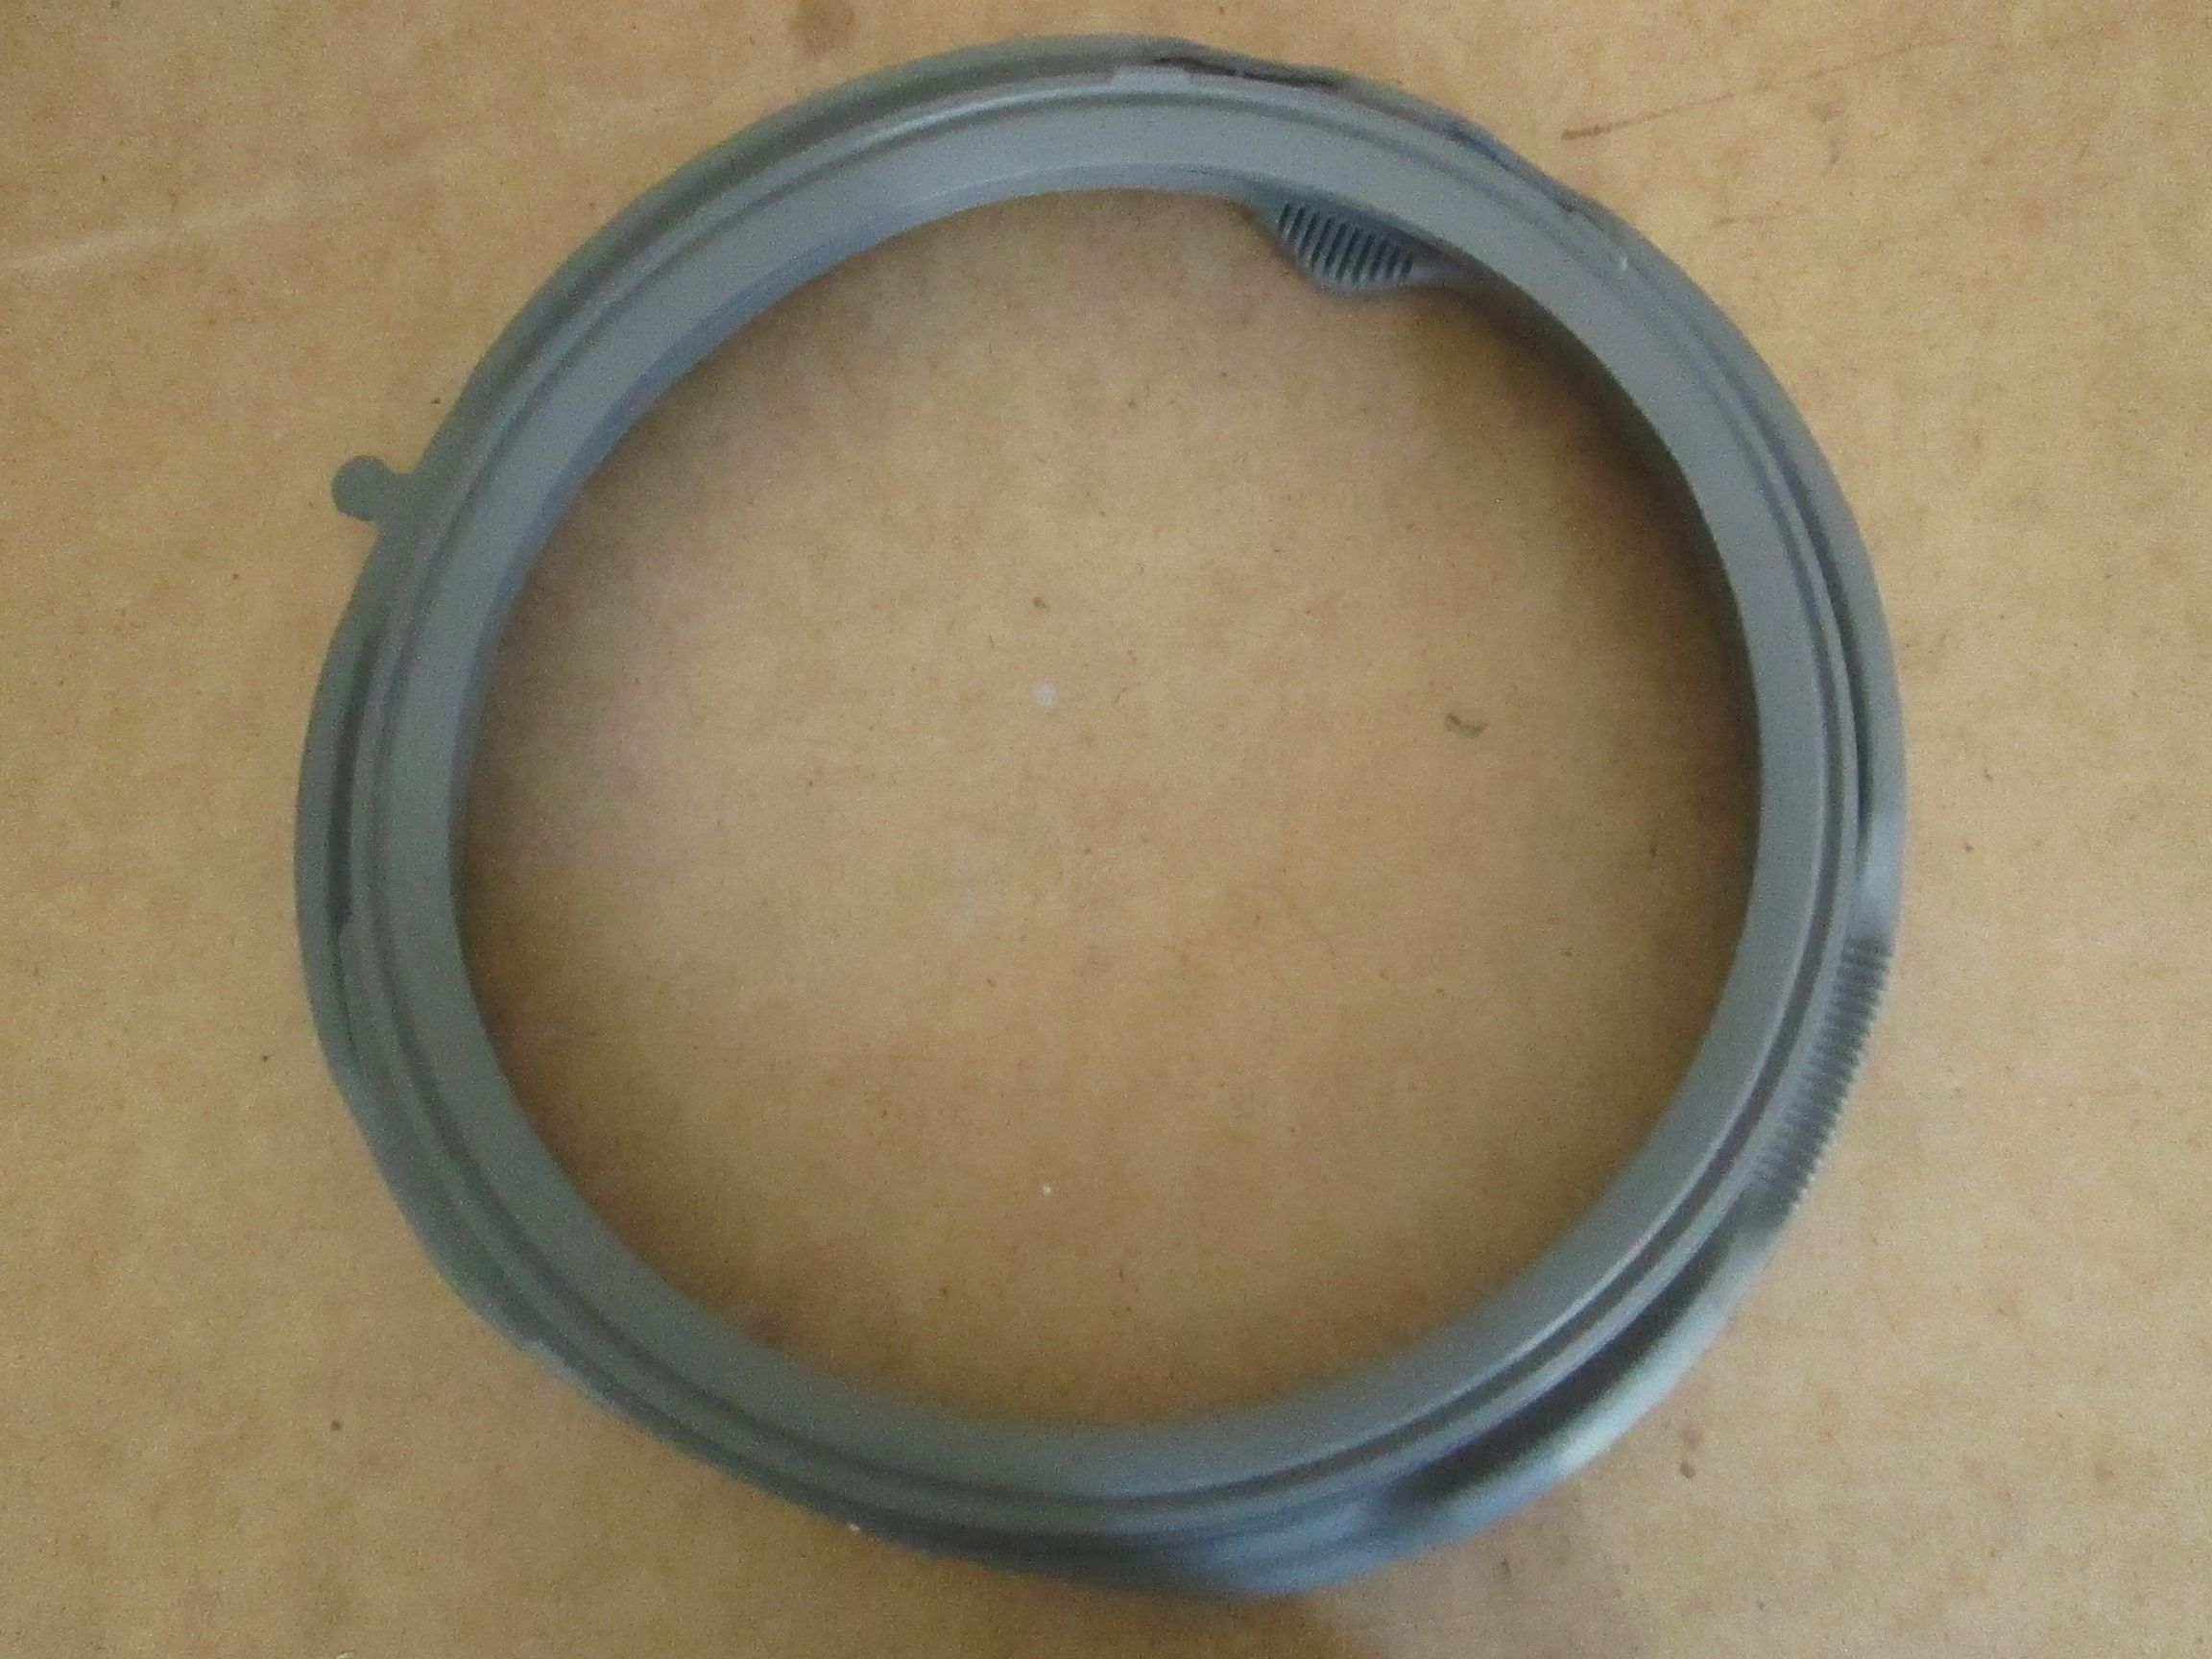 Genuine Blomberg Washing Machine Door Seal Rubber Gasket